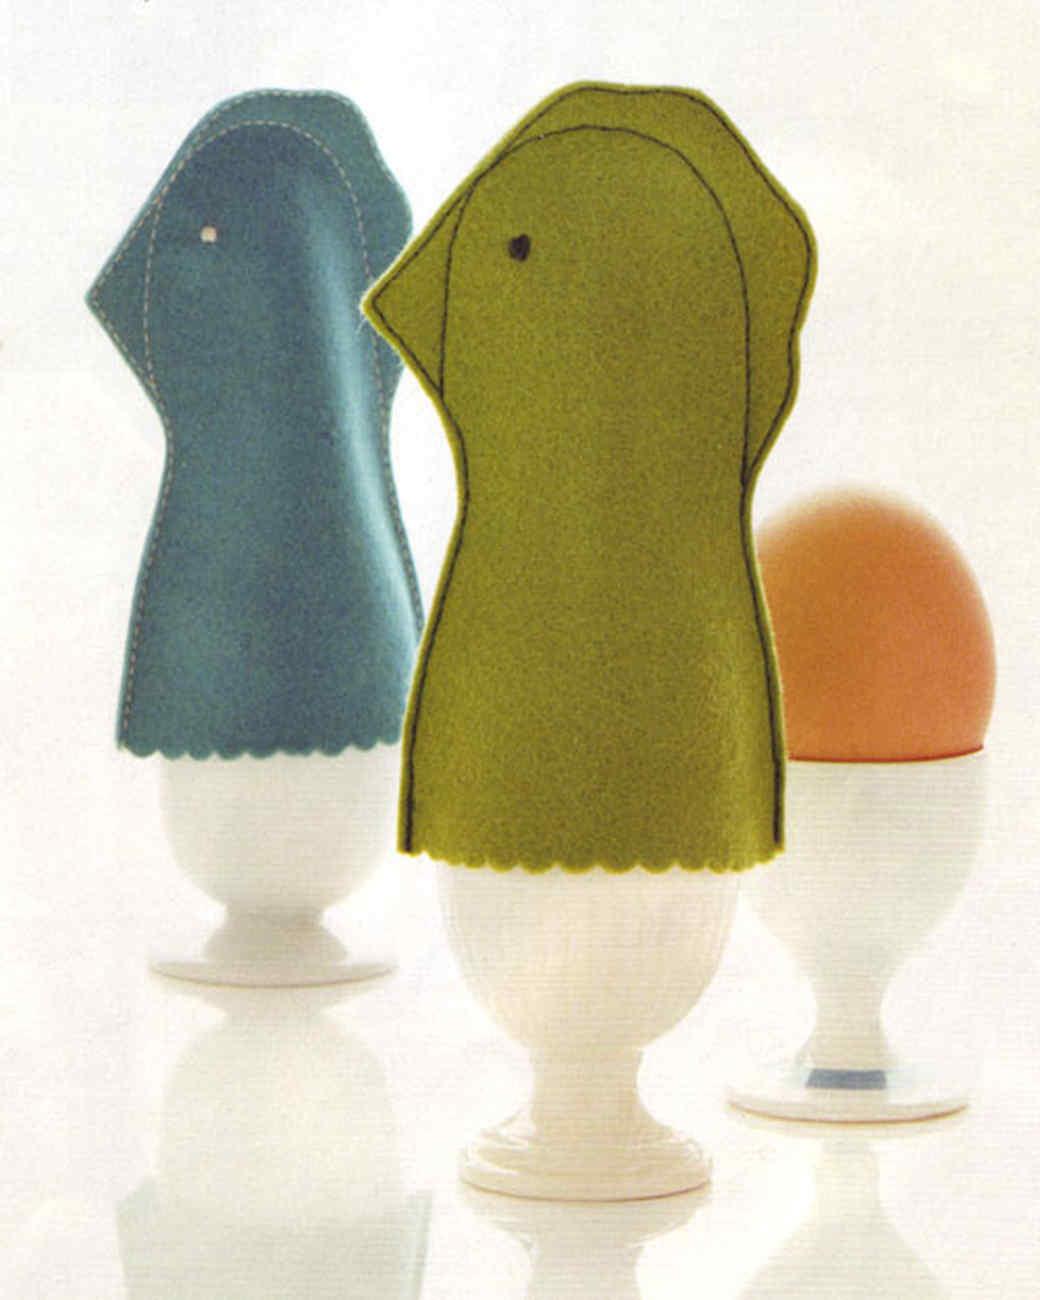 Hen-Shaped Egg Cozies